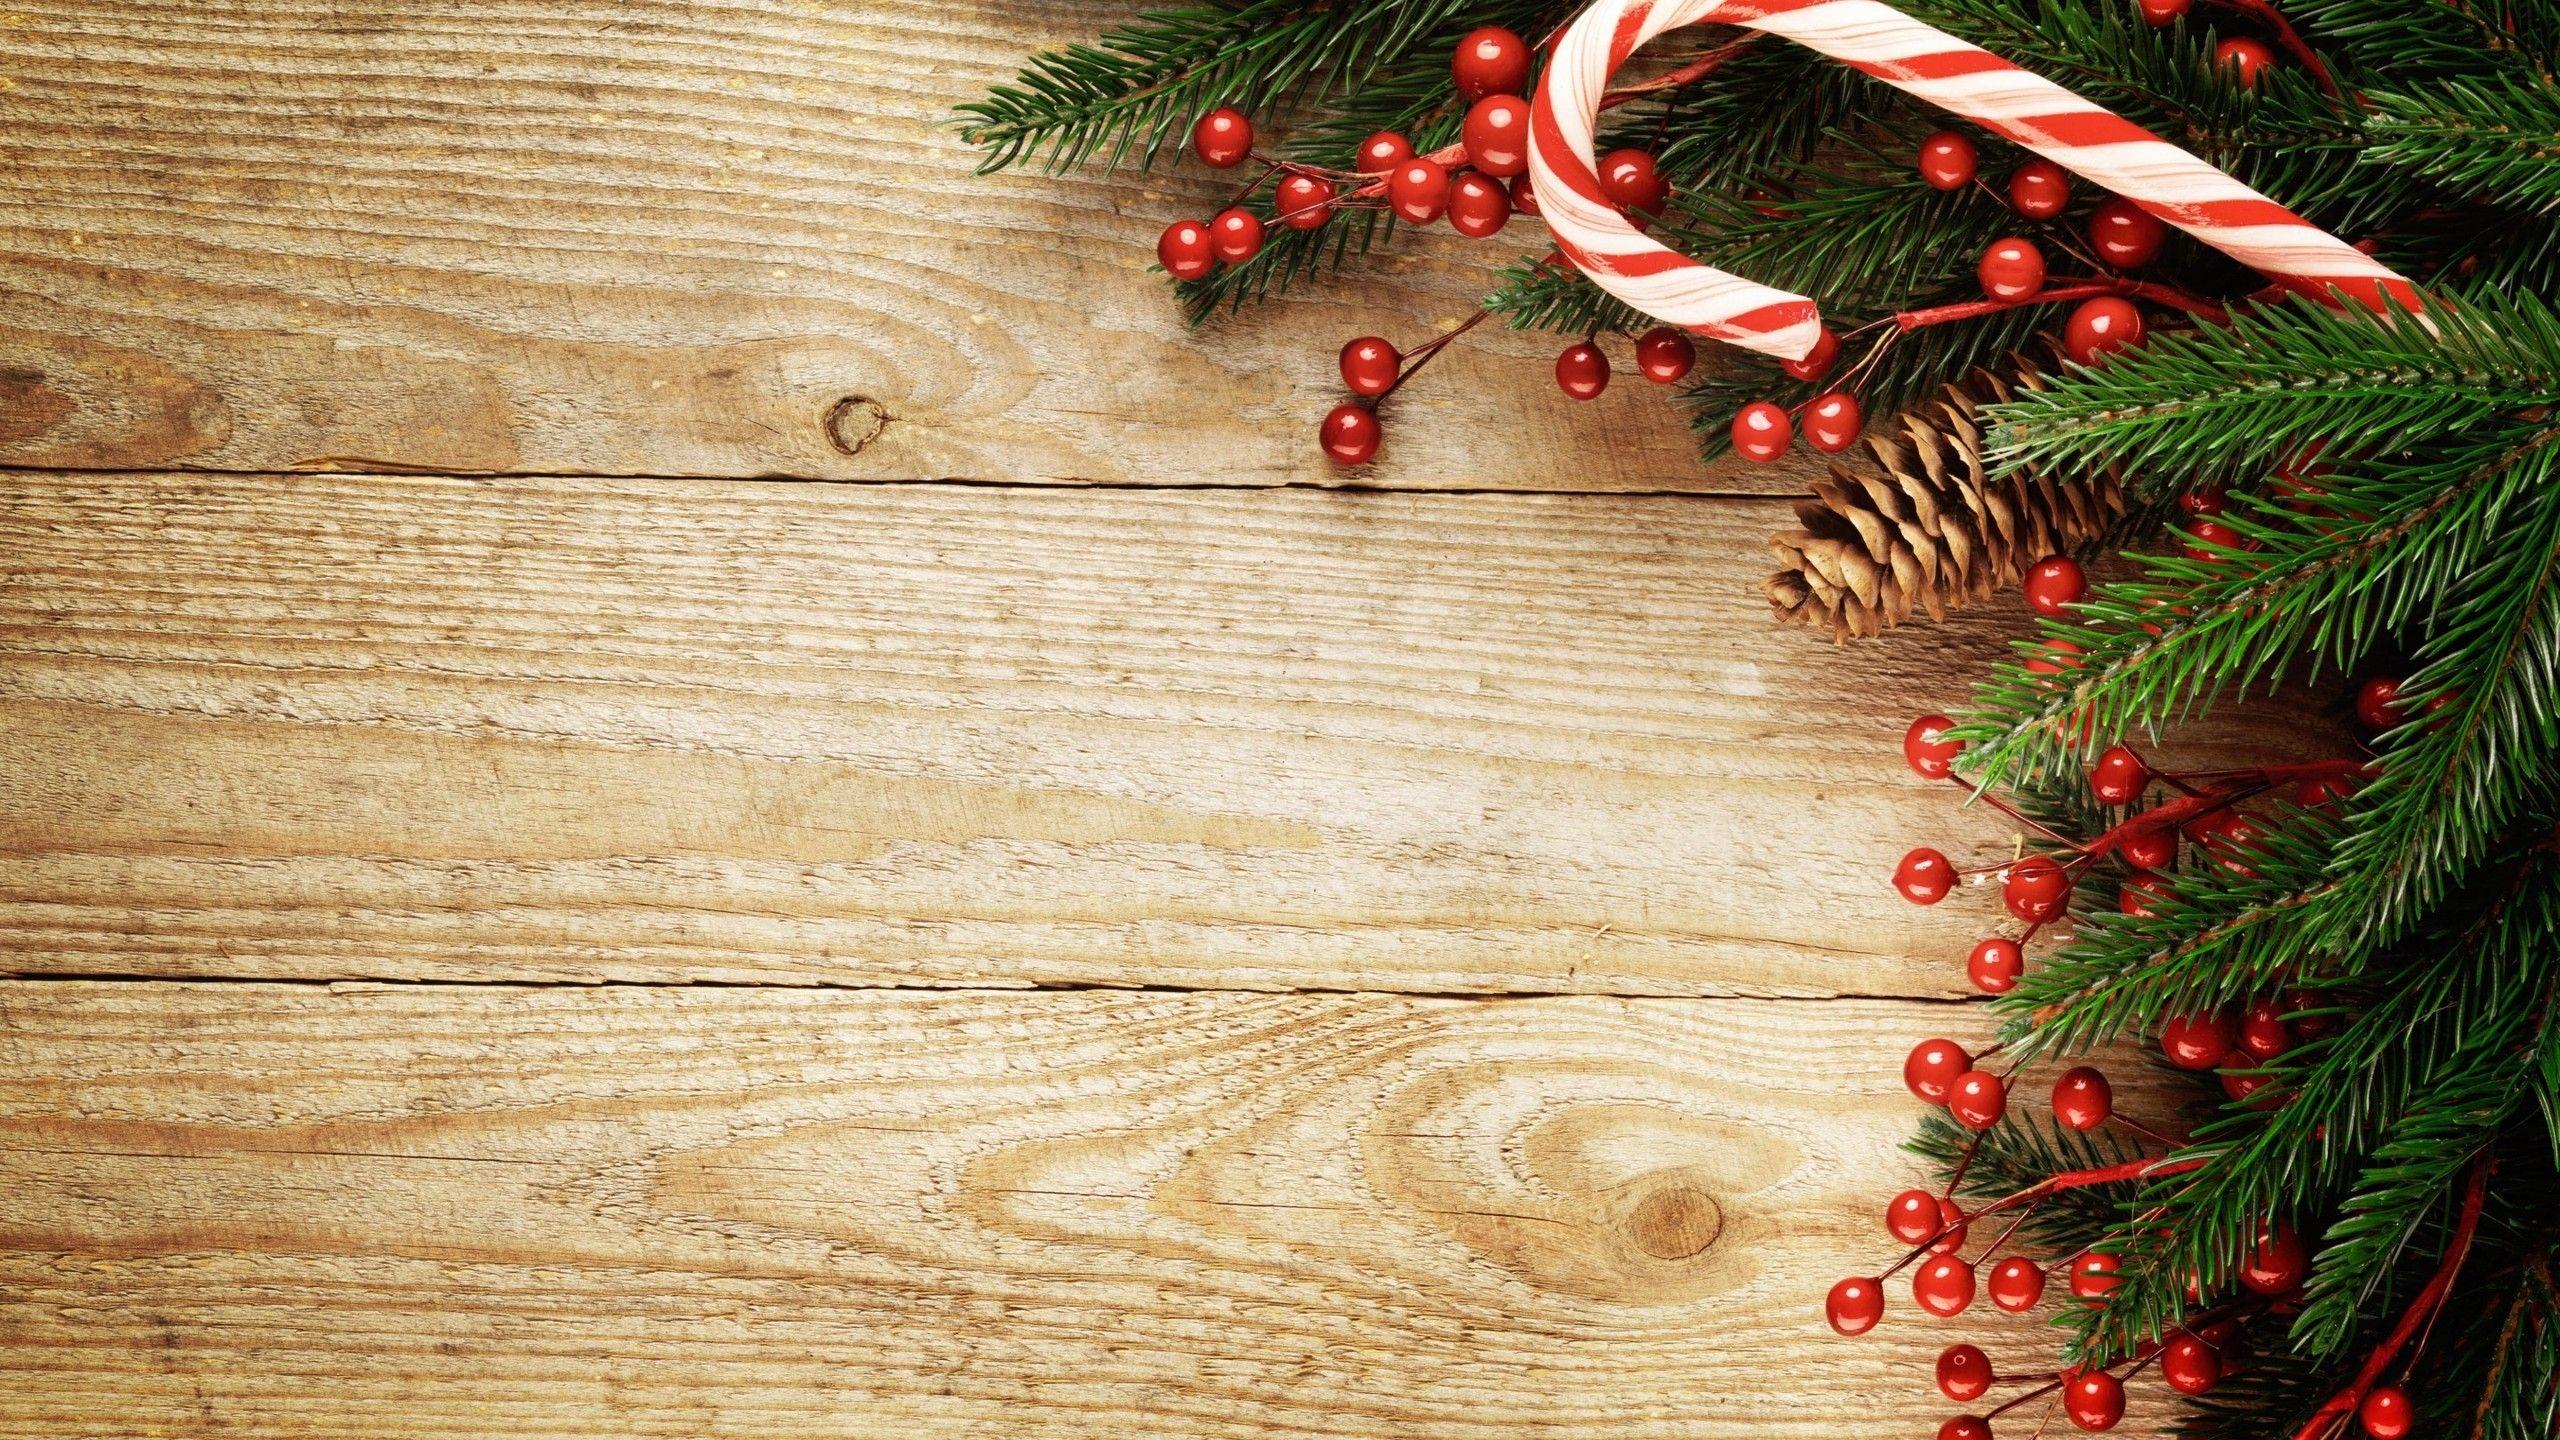 2560x1440 Christmas Decorations Christmas wallpaper free